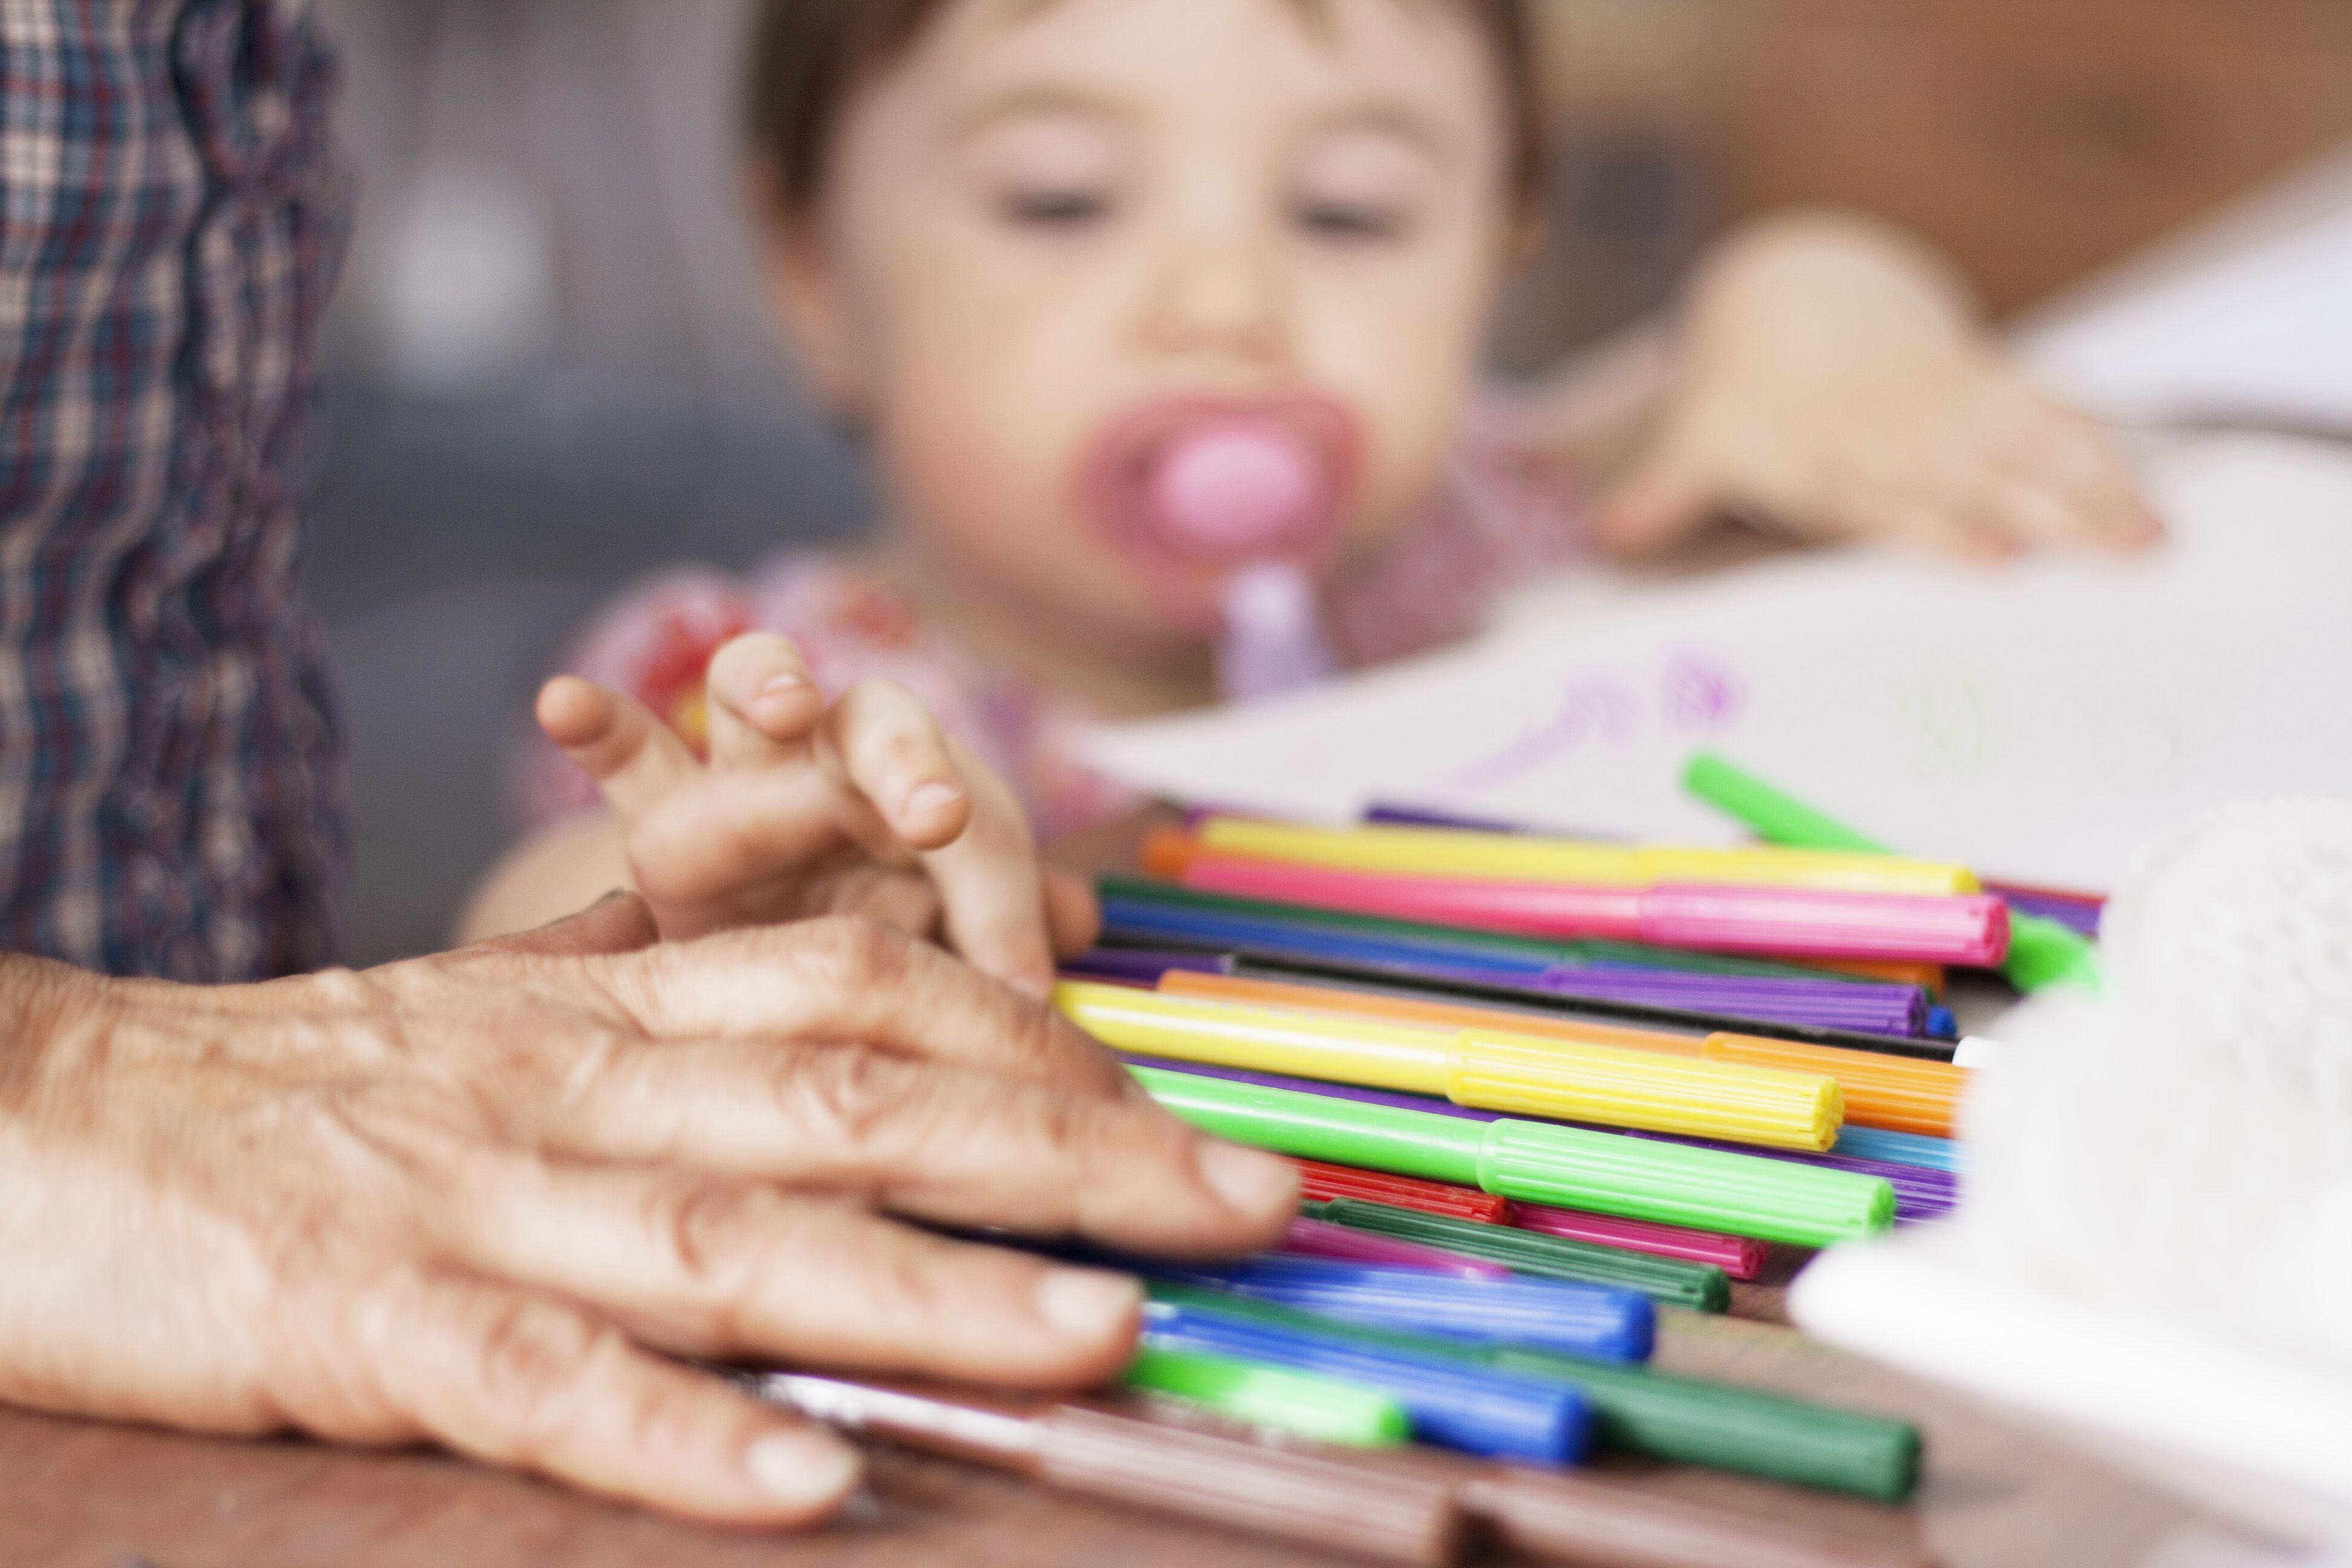 Bambini Birichini ~ Grembiulini carini per bambini birichini i piccoli artisti di